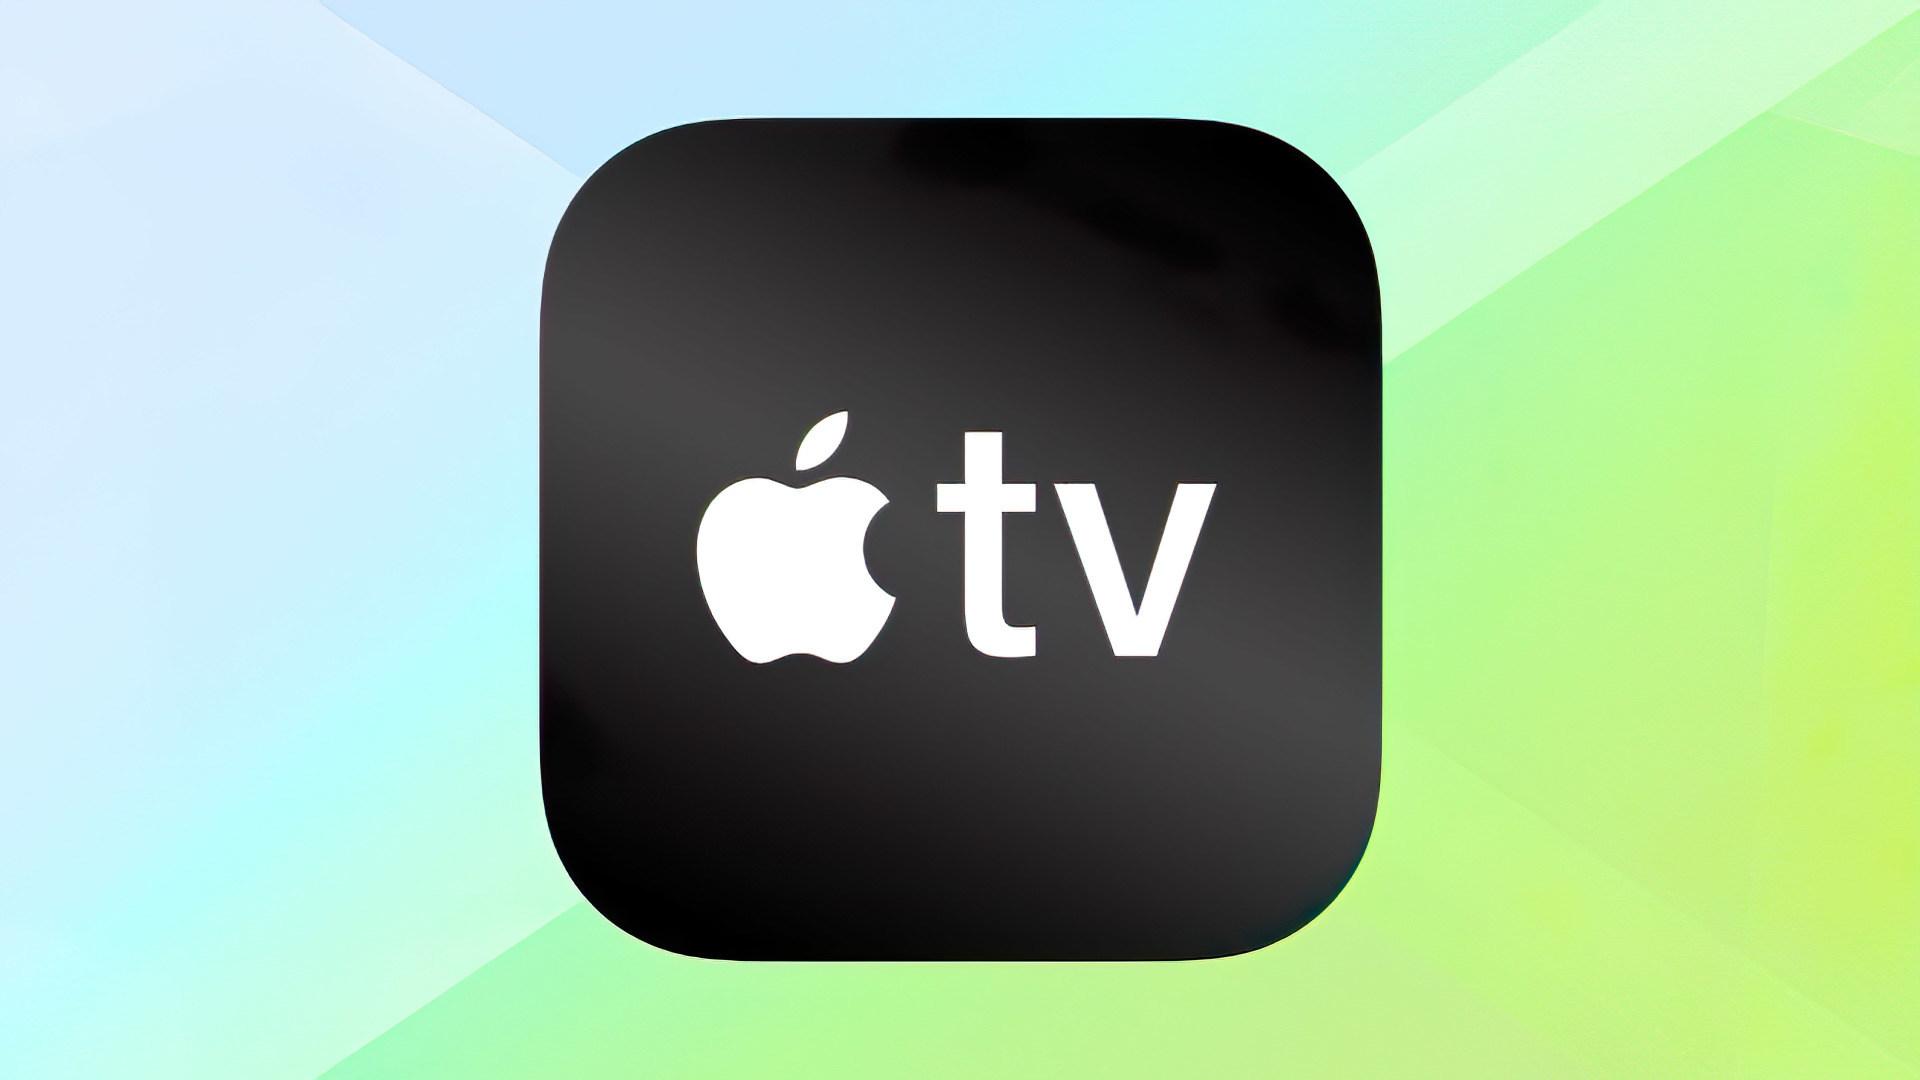 Apple, Logo, Tv, Apple Tv, Apple TV+, 739700